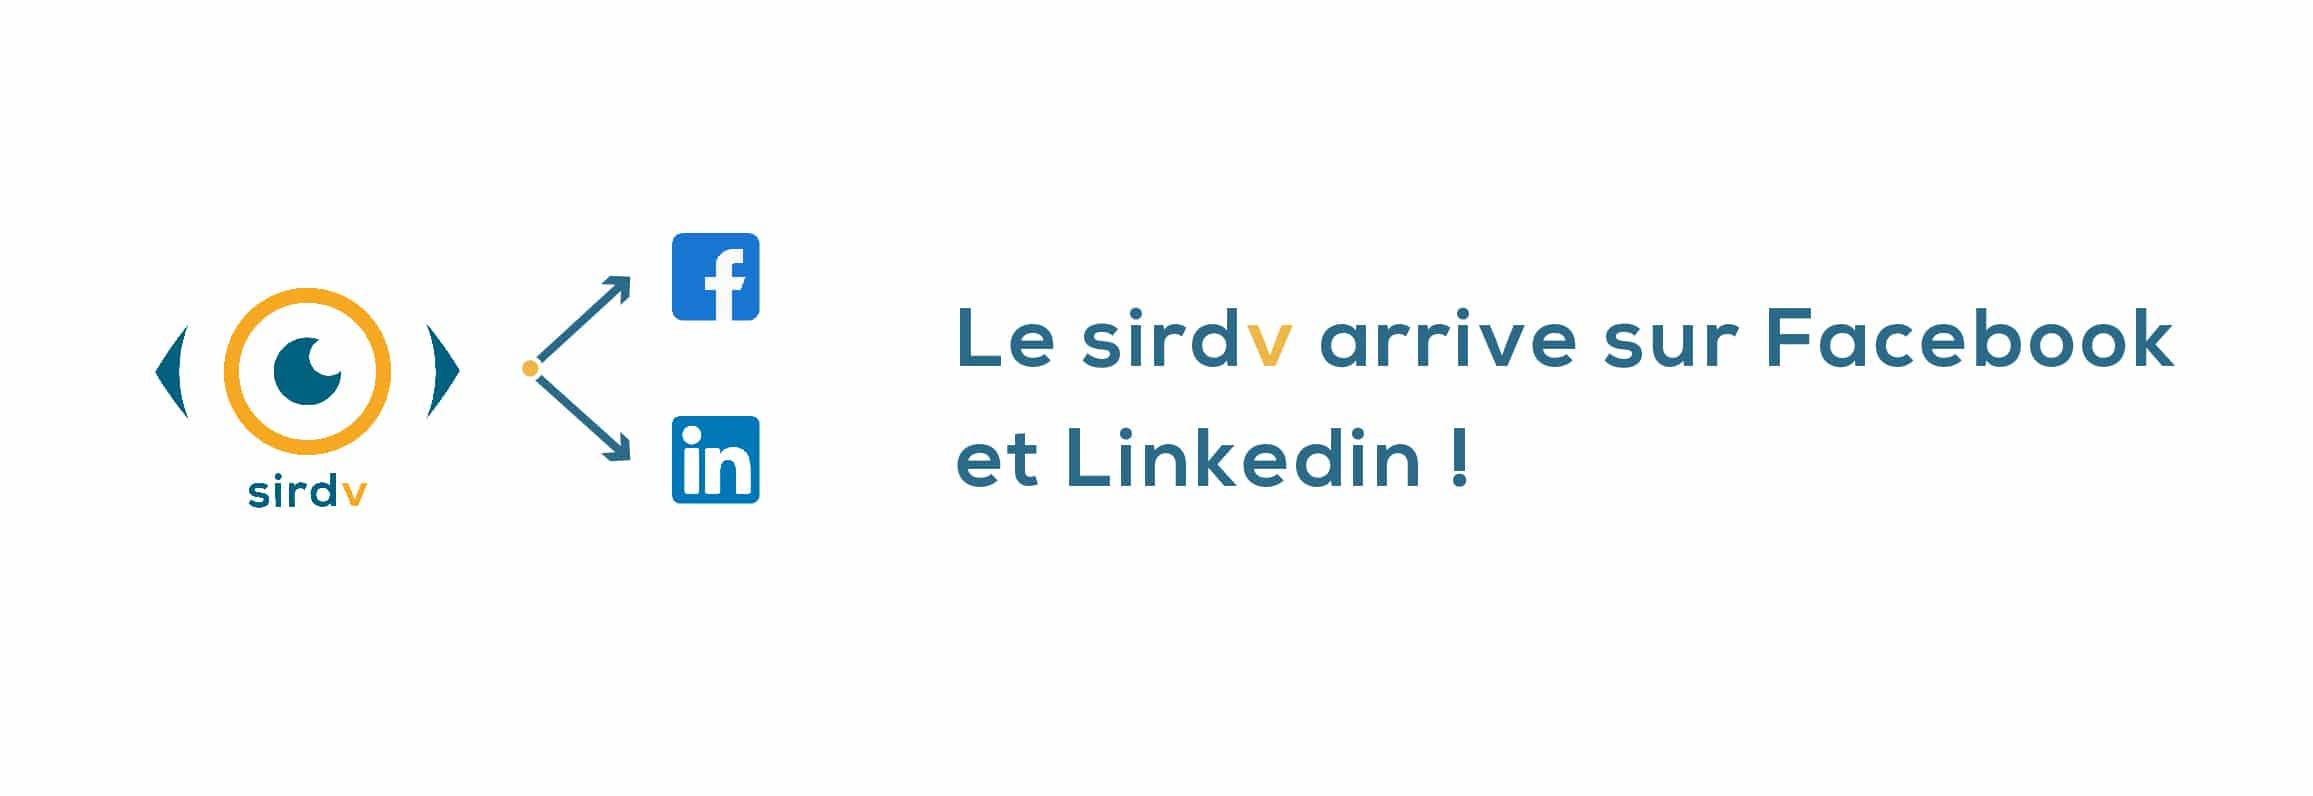 Le-sirdv-arrive-sur-Facebook-et-Linkedin